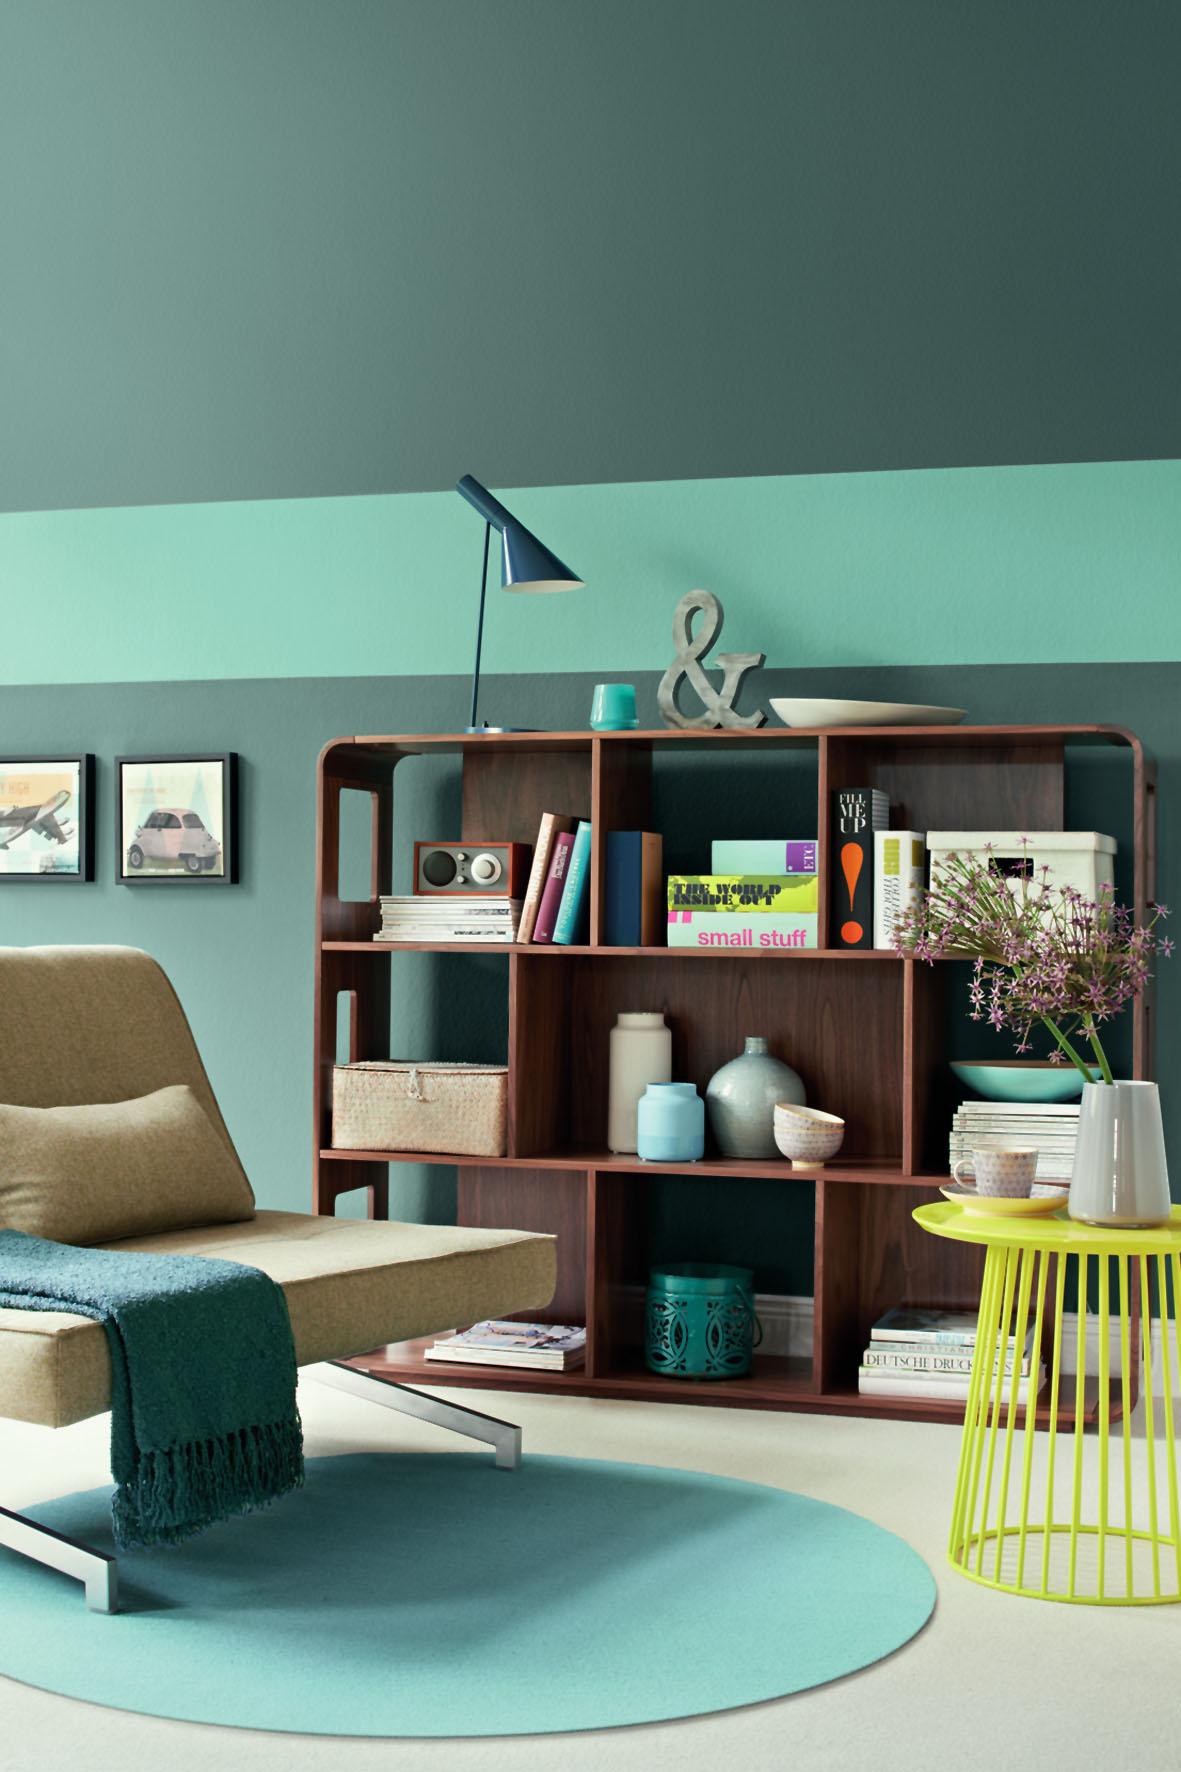 Perfekt Grüne Farbe Bringt Atmosphäre In Den Raum